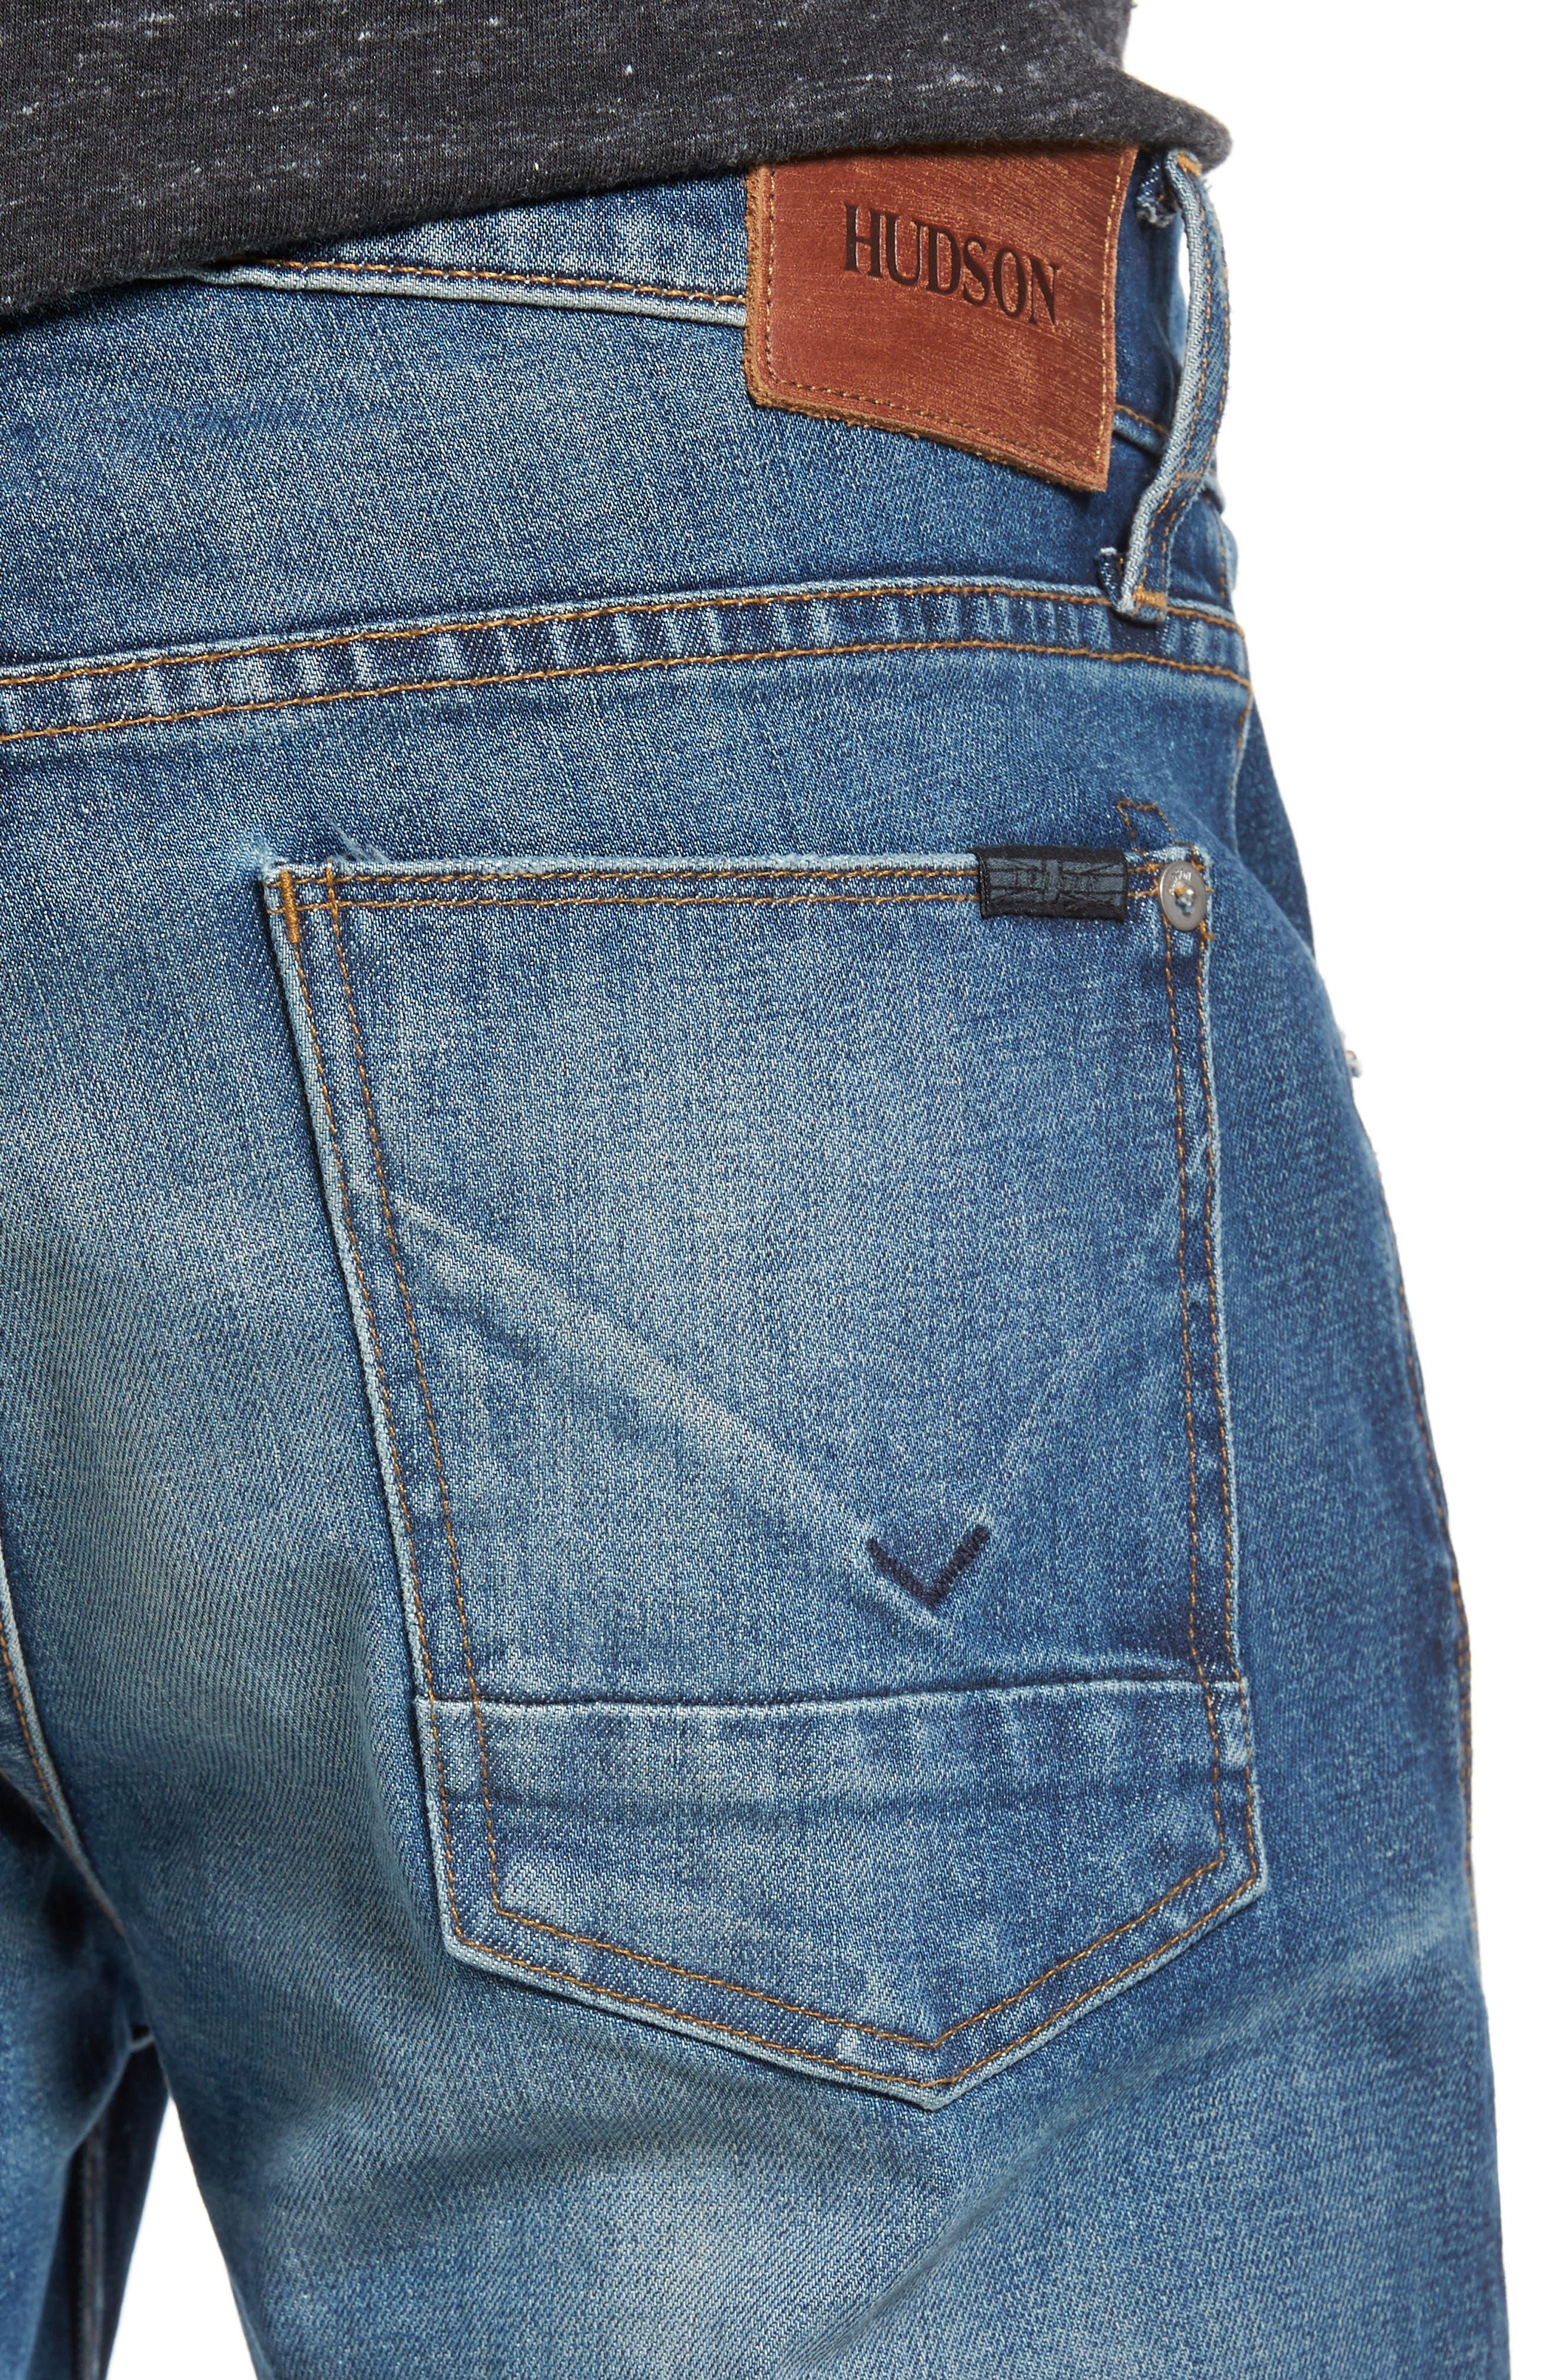 Blake Slim Fit Jeans,                             Alternate thumbnail 4, color,                             425